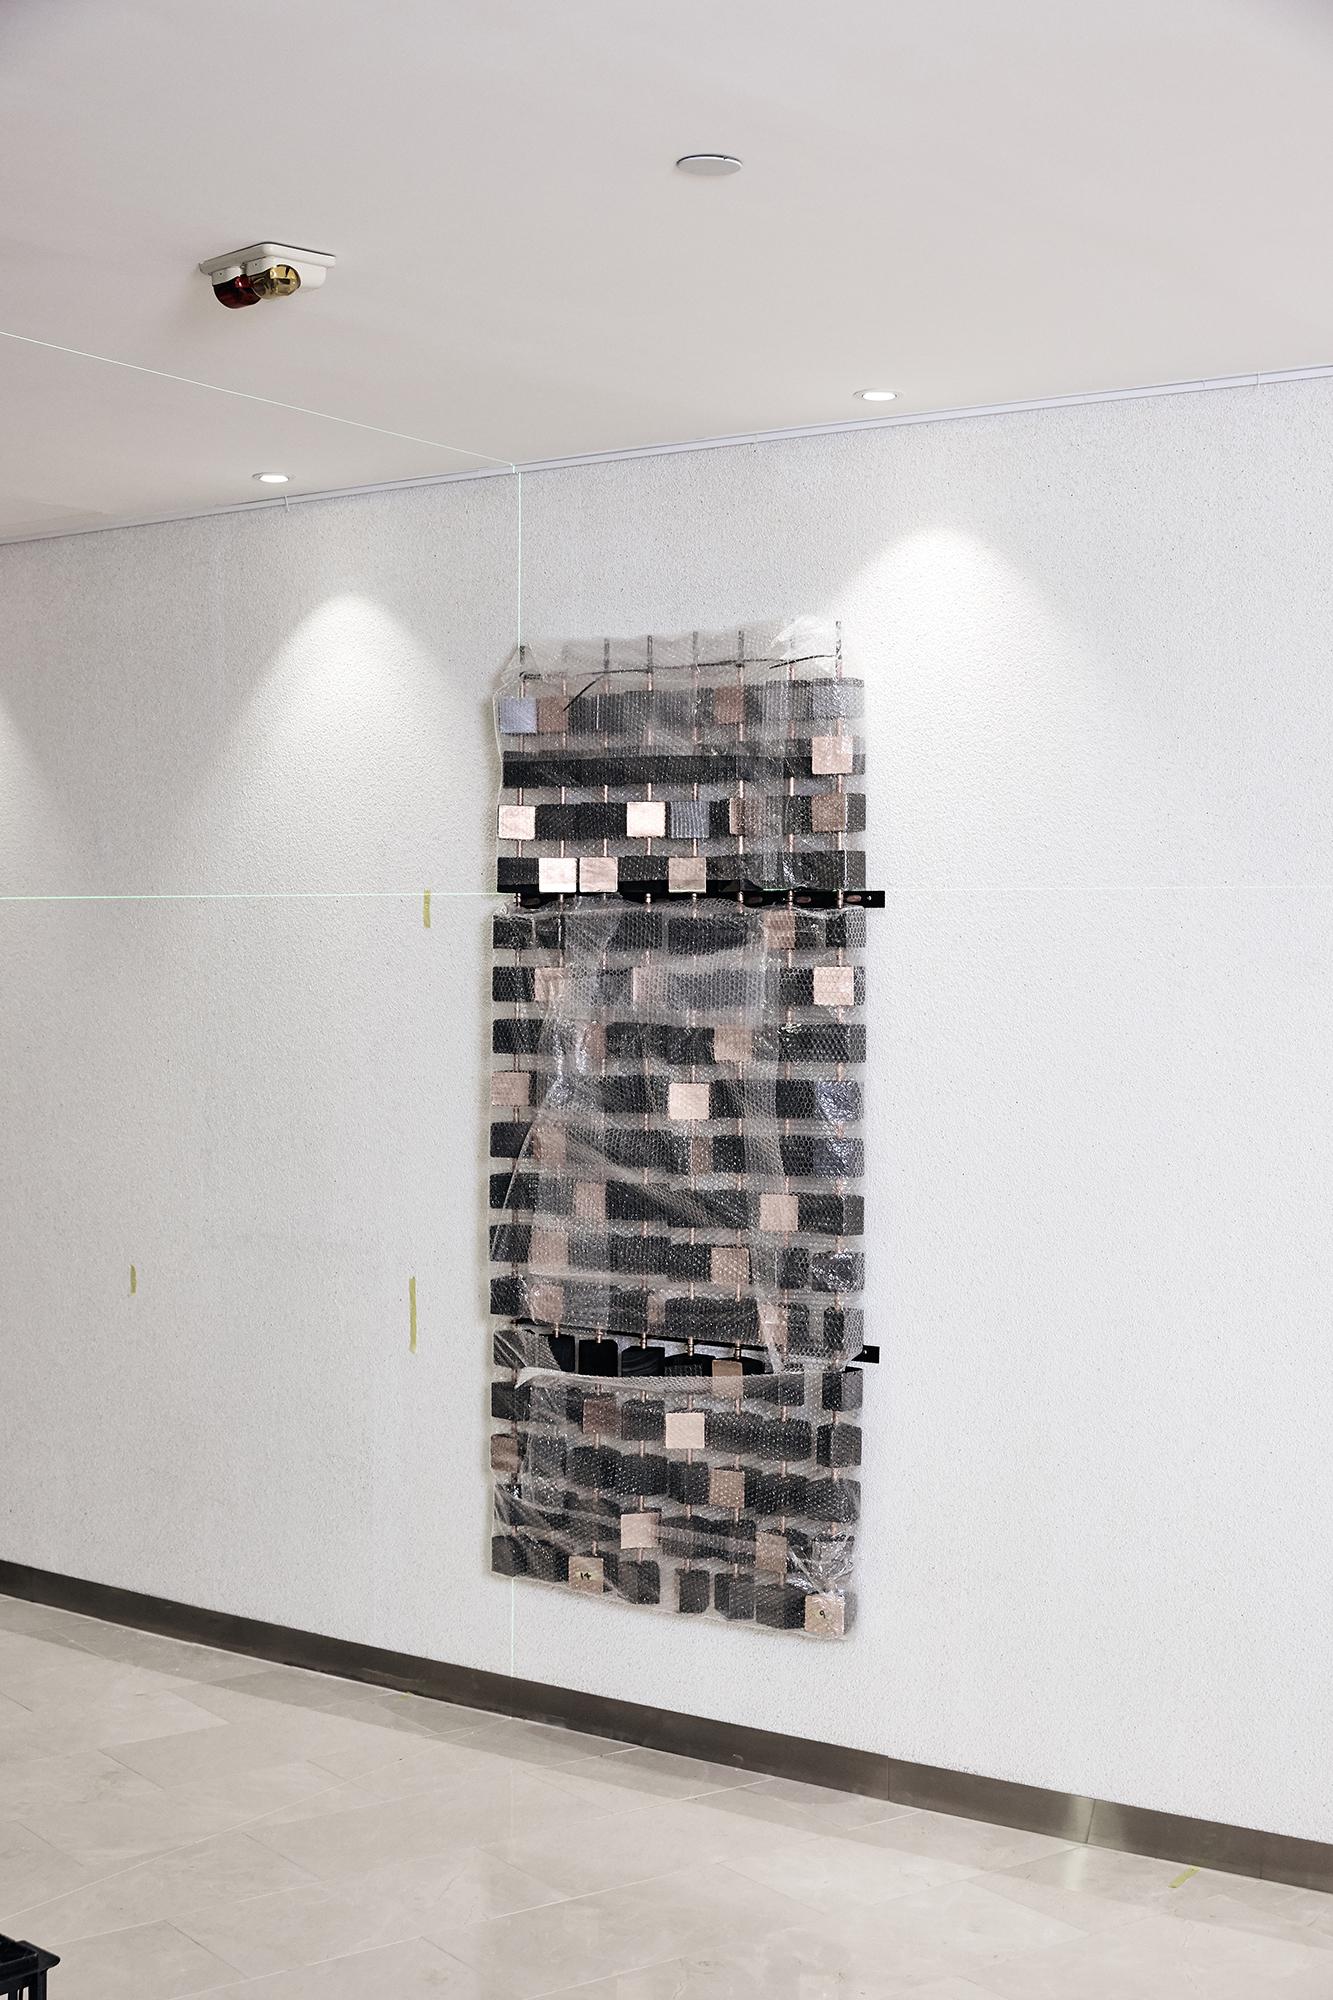 SoWatt-WIP-Sculpture-Corporate-Art-Timber-Oregon-Steel-Copper-Deloitte-11.jpg